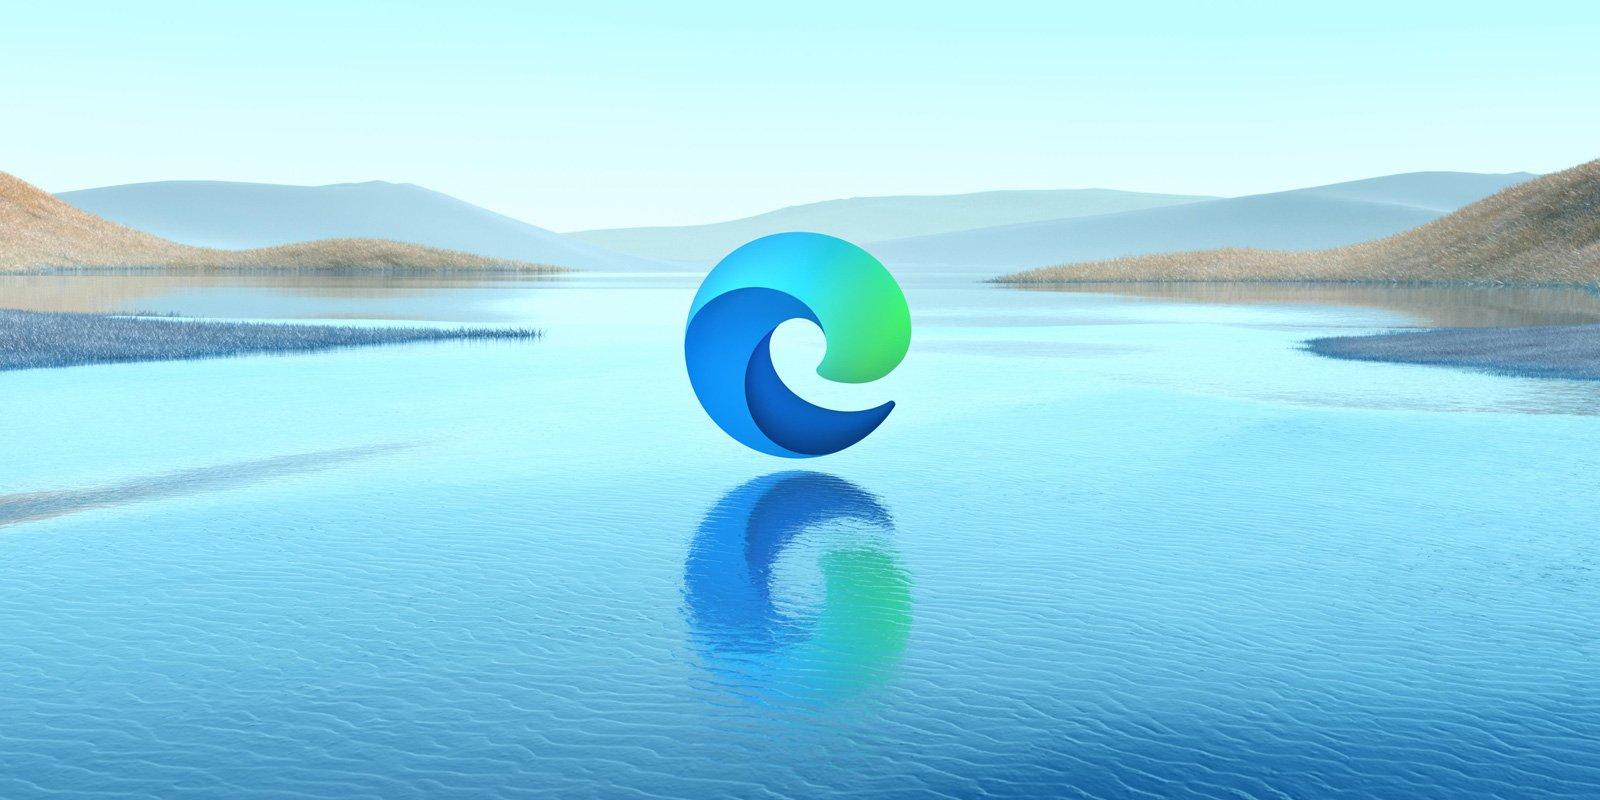 edge-water-large.jpg